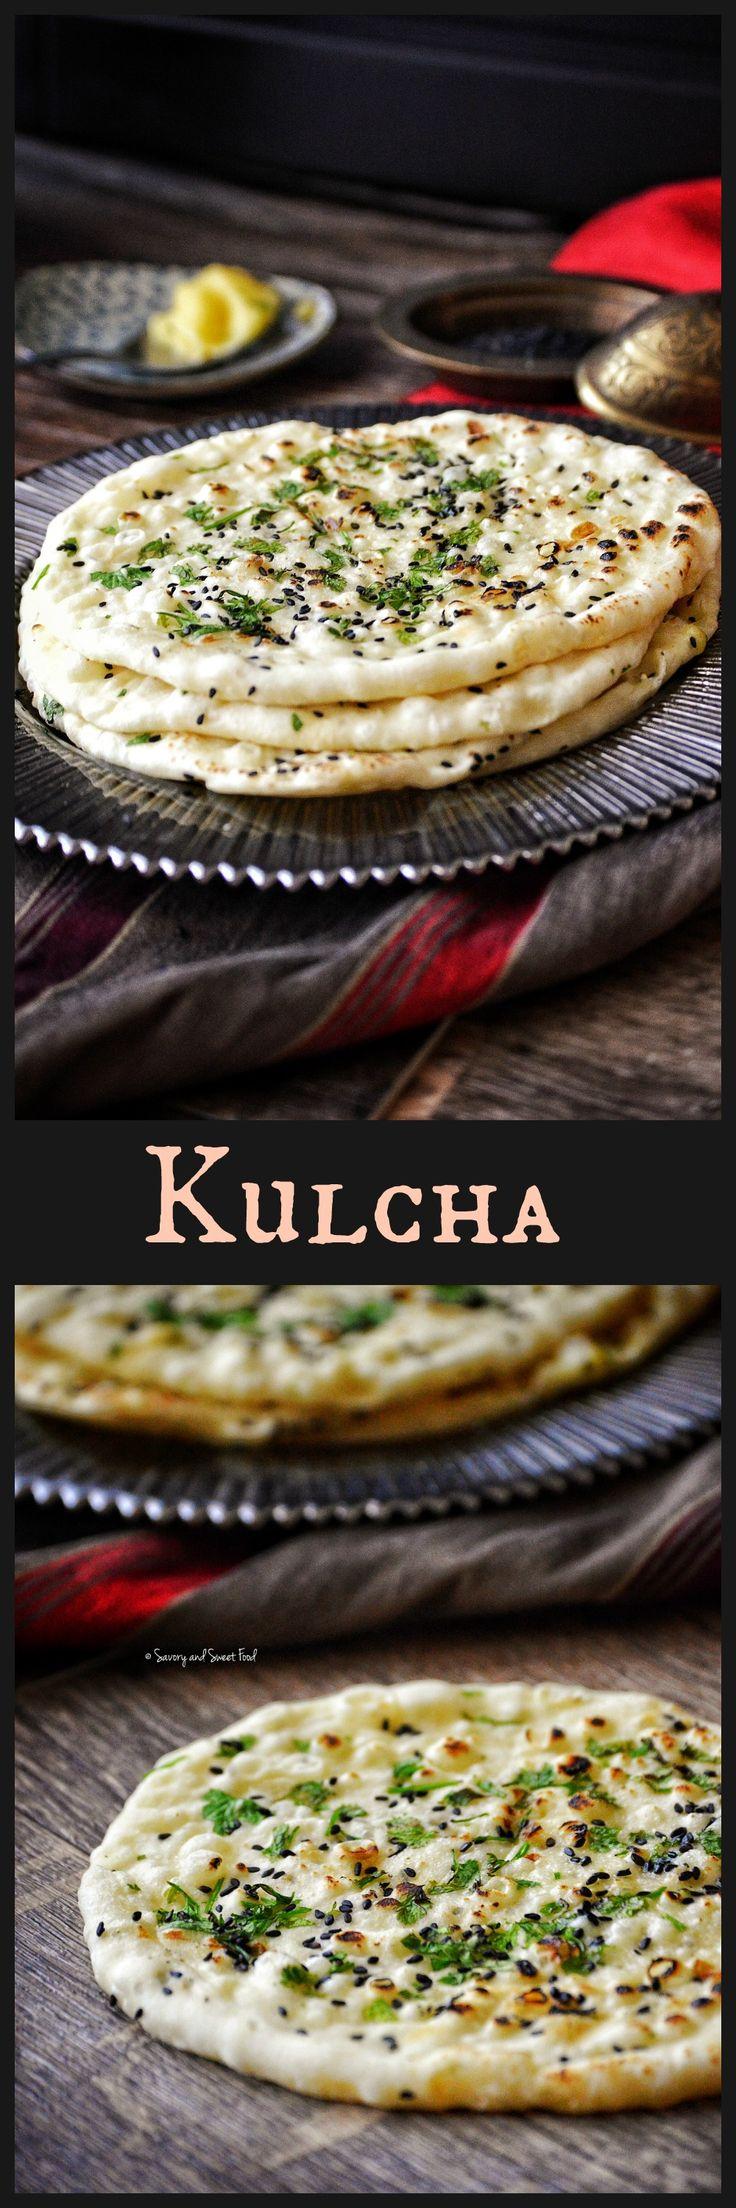 Kulcha/ Indian Flat Bread | Indian food recipes, Indian ...